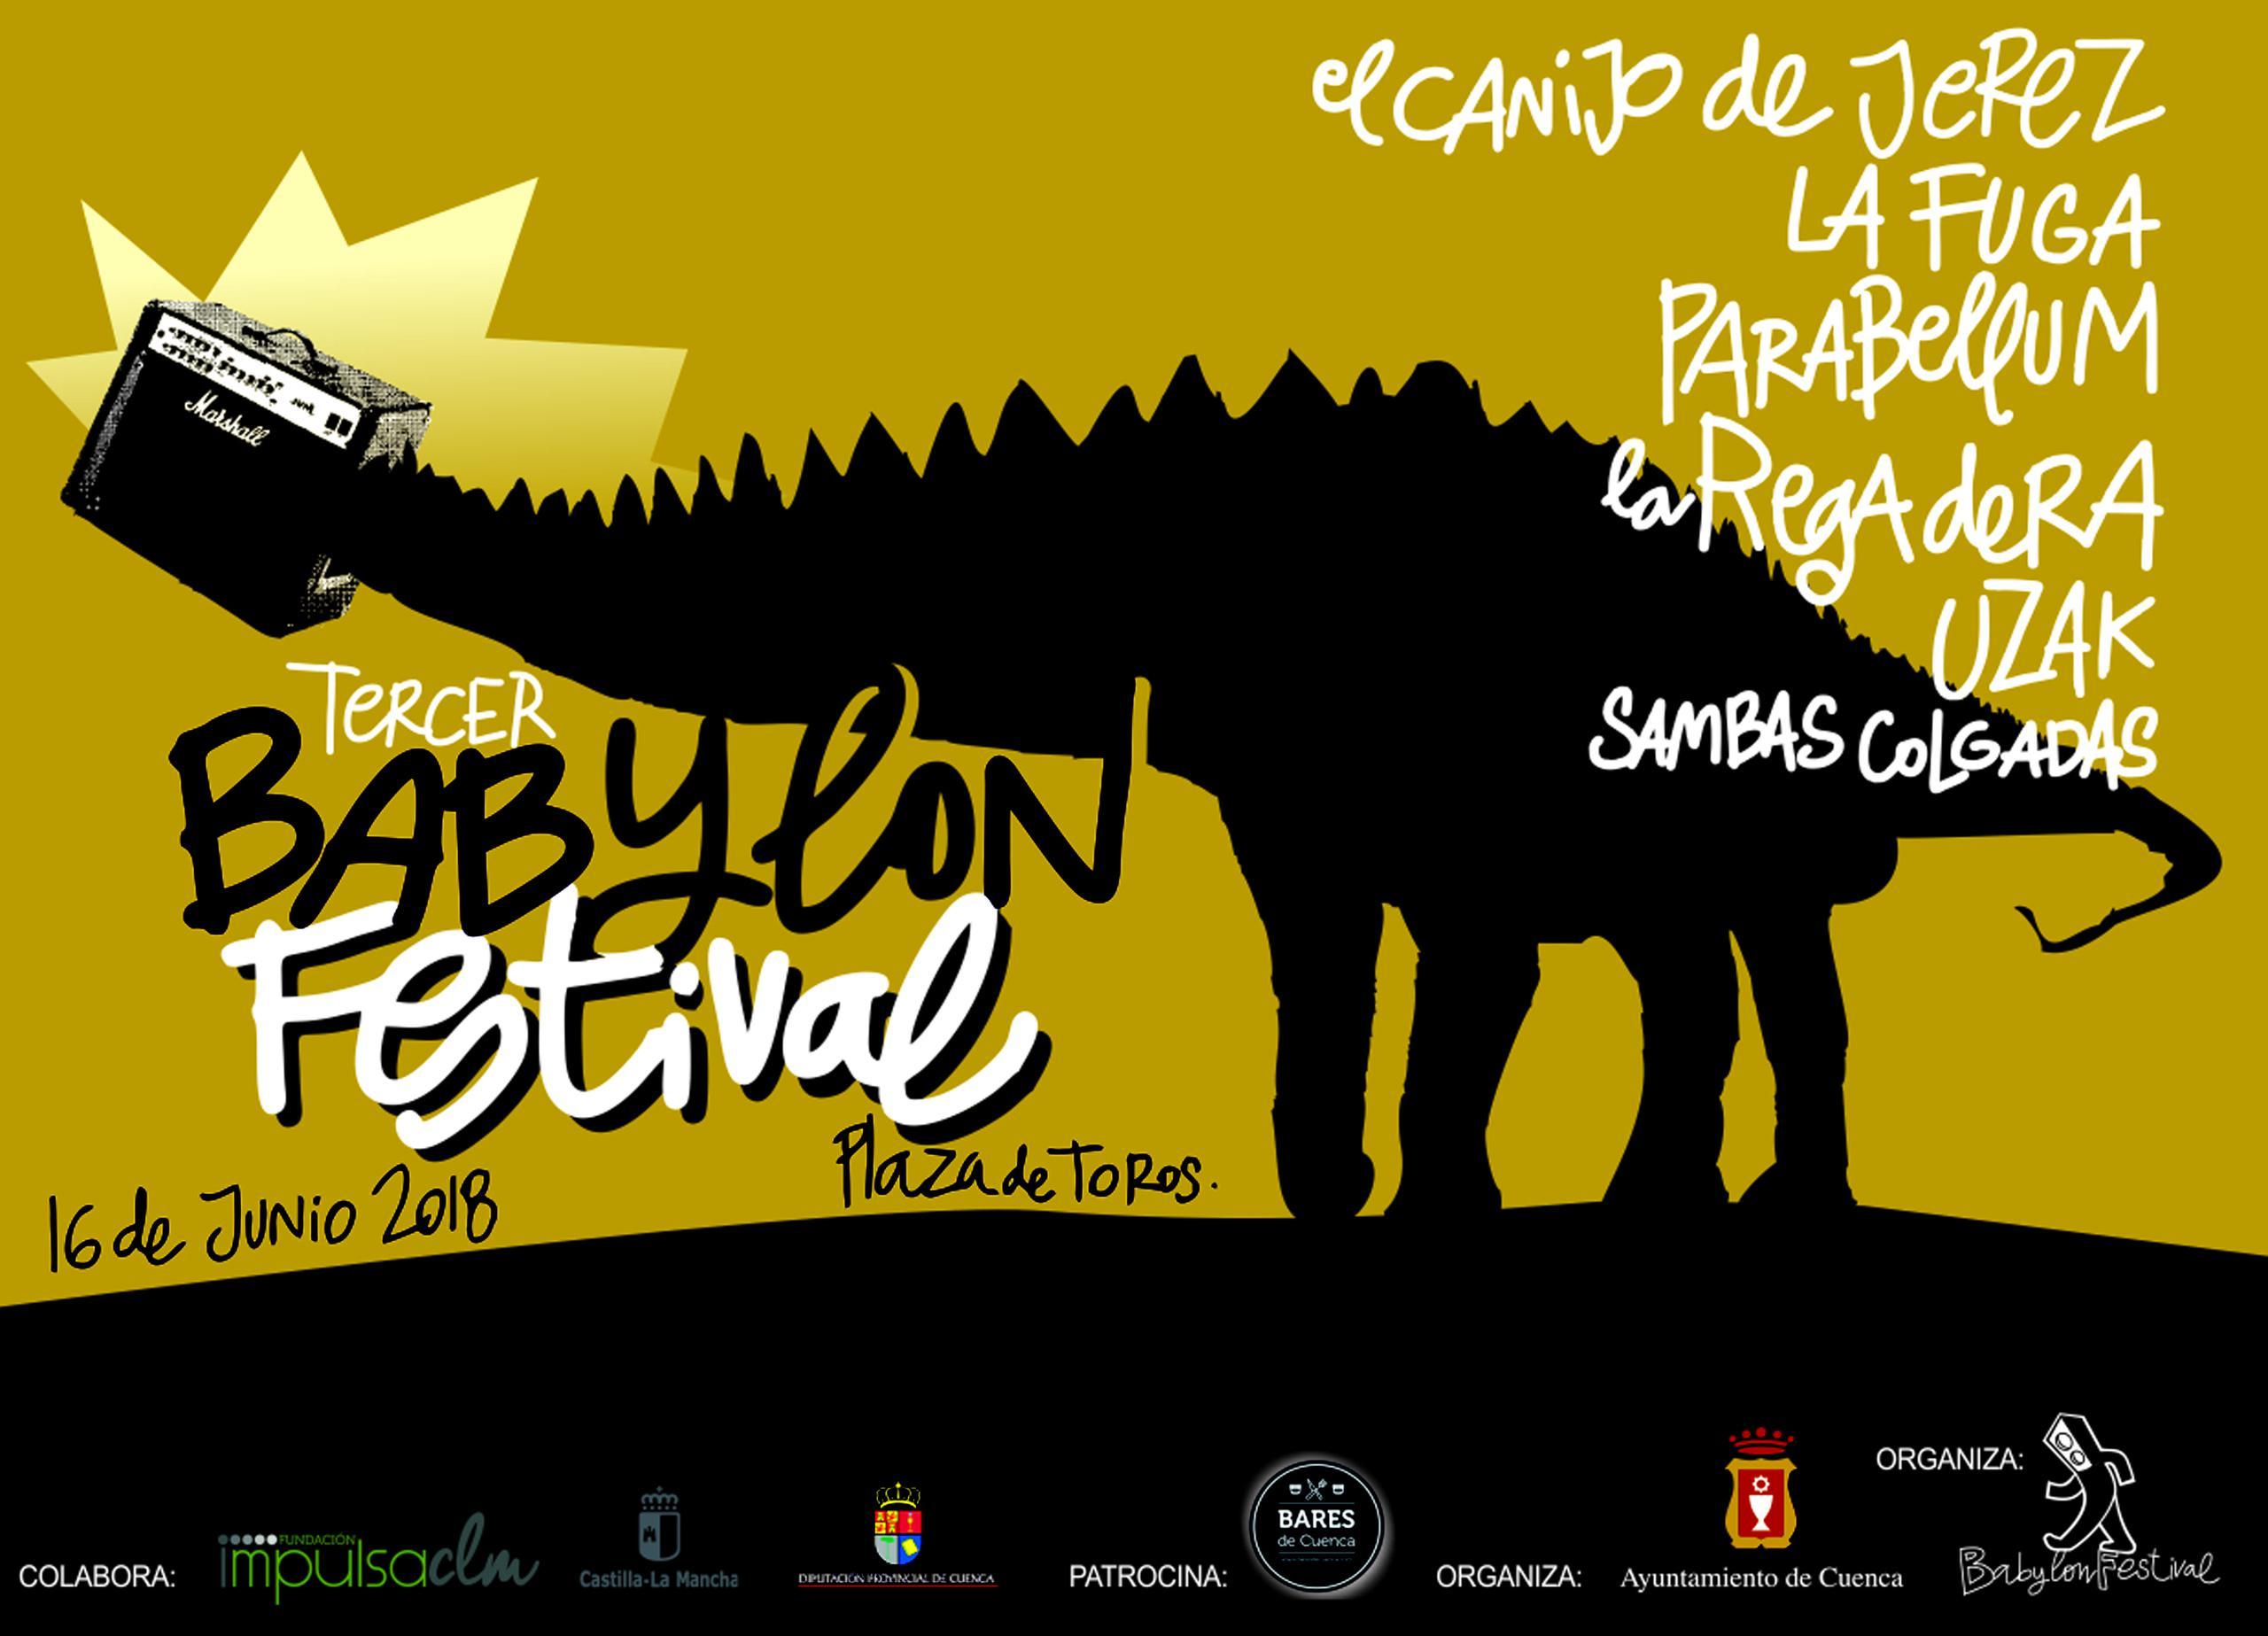 Cartel con las bandas de Babylon